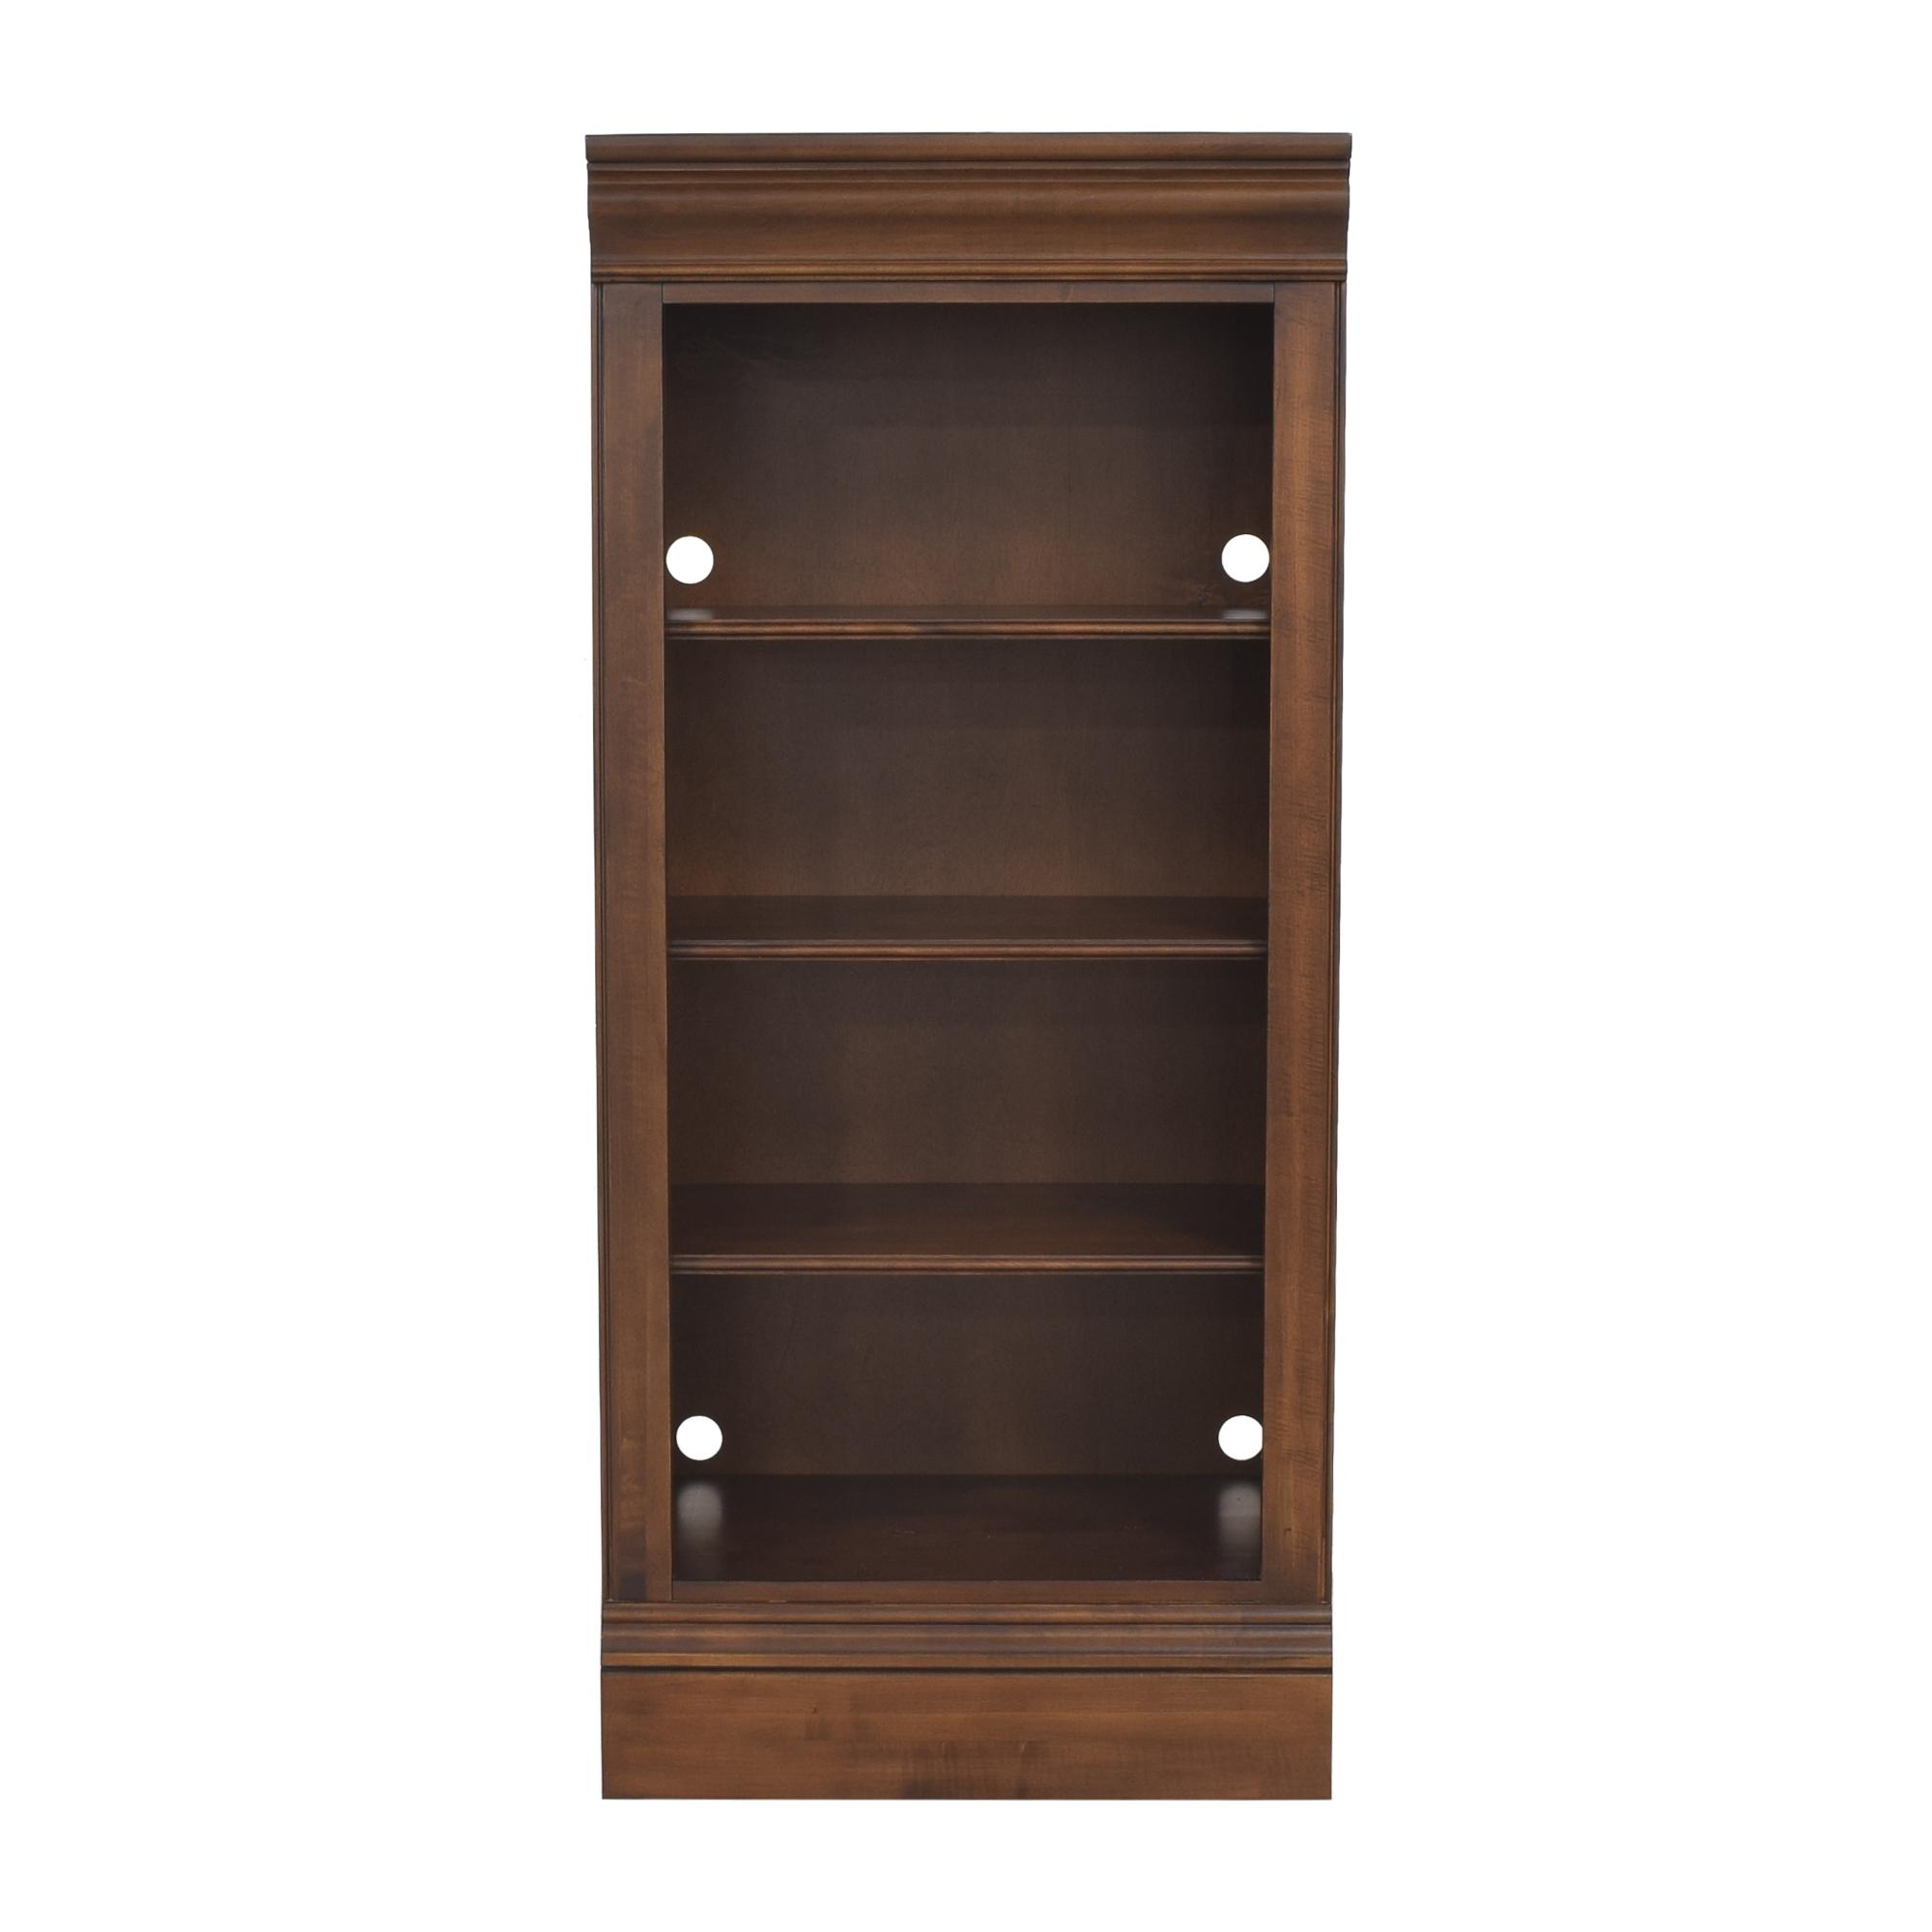 Kincaid Furniture Kincaid Media Tower Cabinet ct